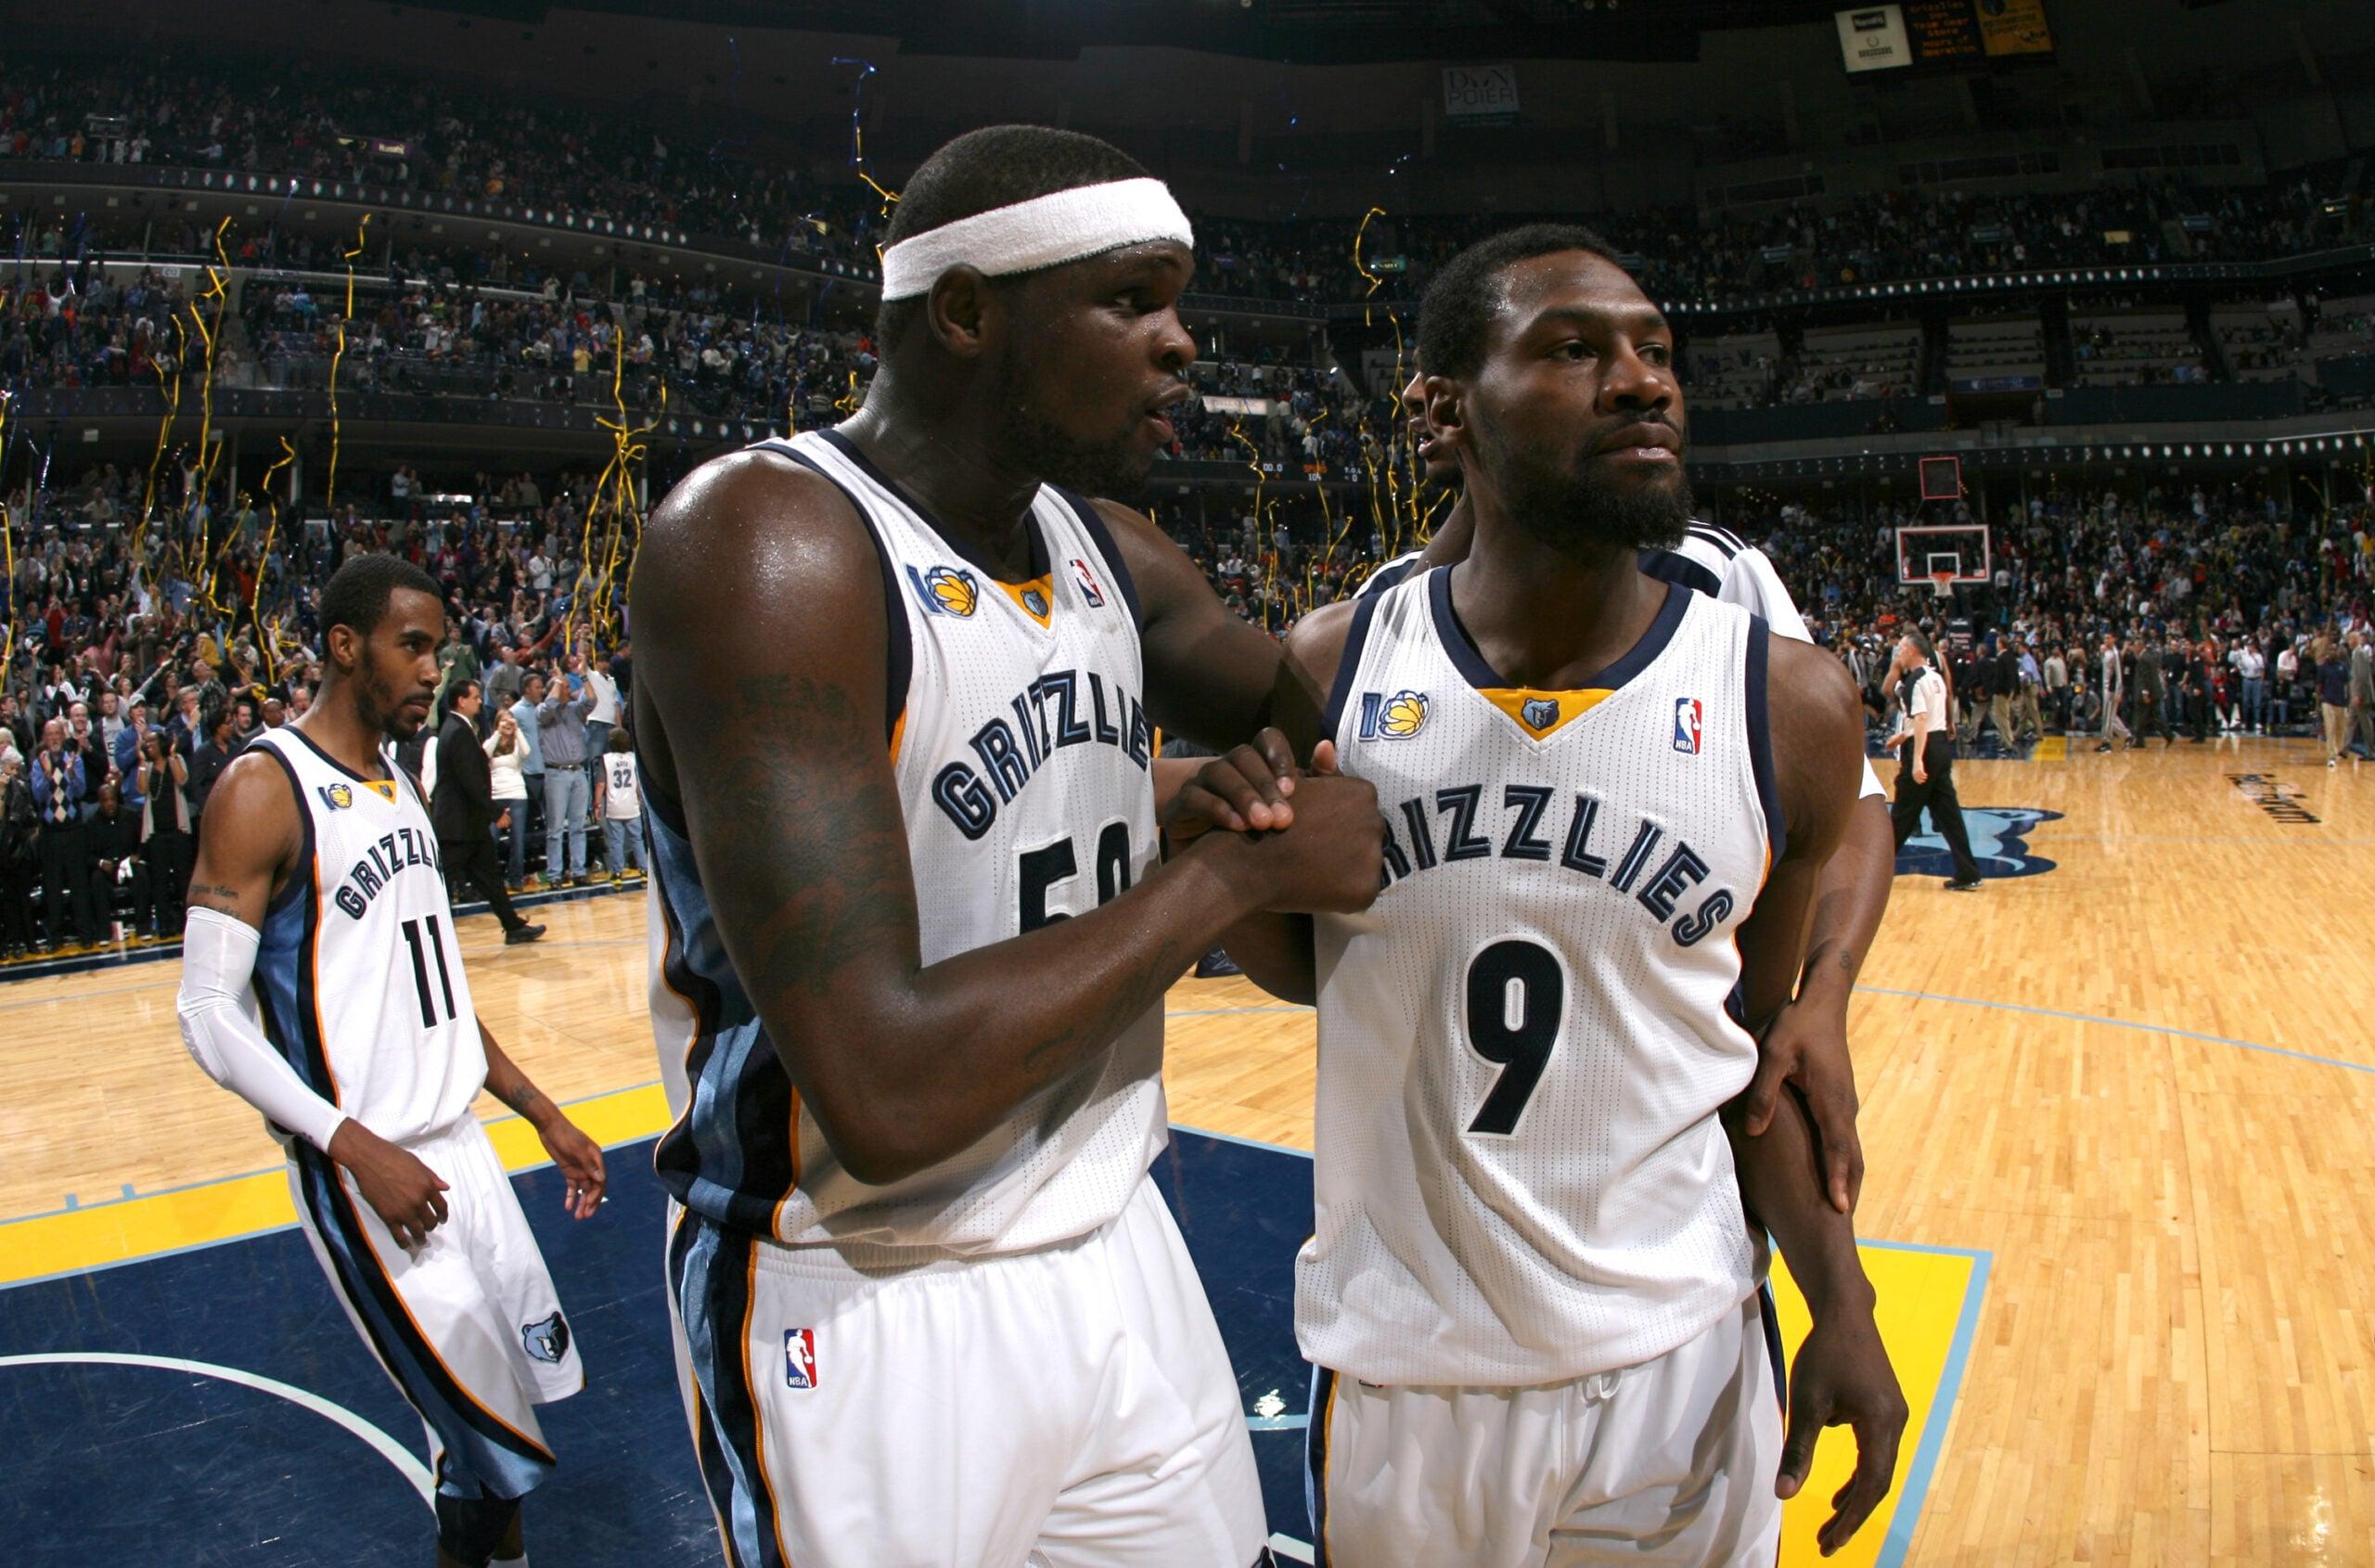 Memphis Grizzlies to retire Zach Randolph and Tony Allen jerseys